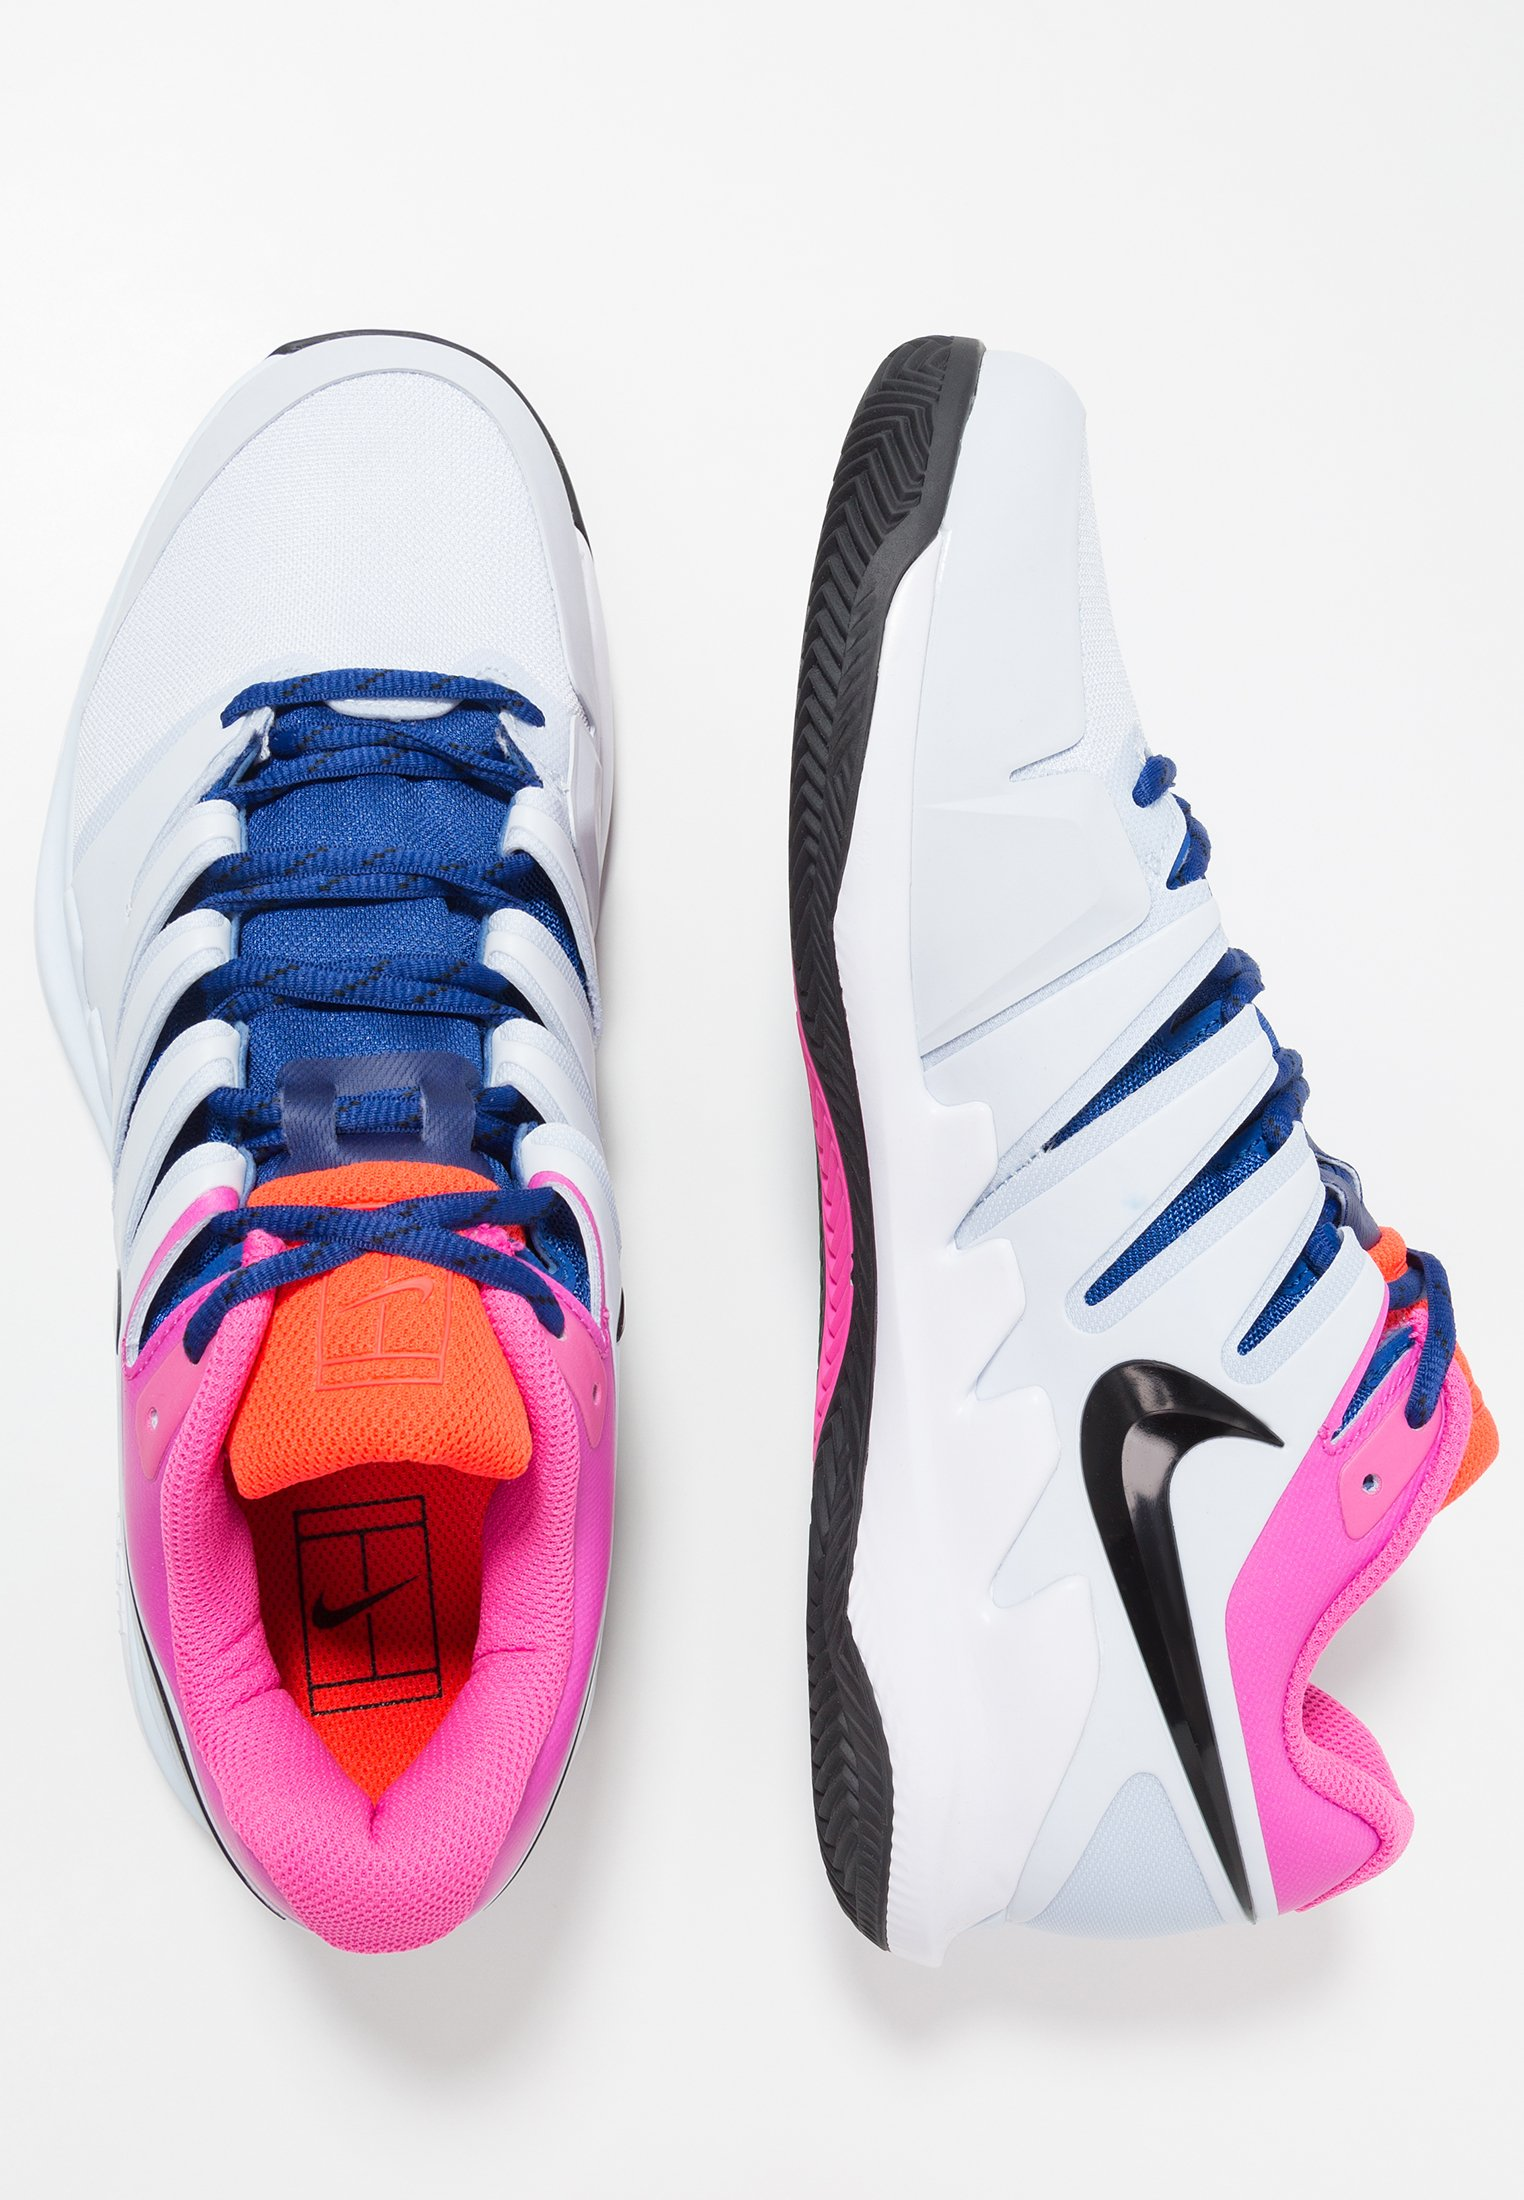 AIR ZOOM VAPOR X CLAY SHOE Chaussures de tennis pour terre battueerre battue half blueblackwhitelaser fuchsiabright crimsonindigo force